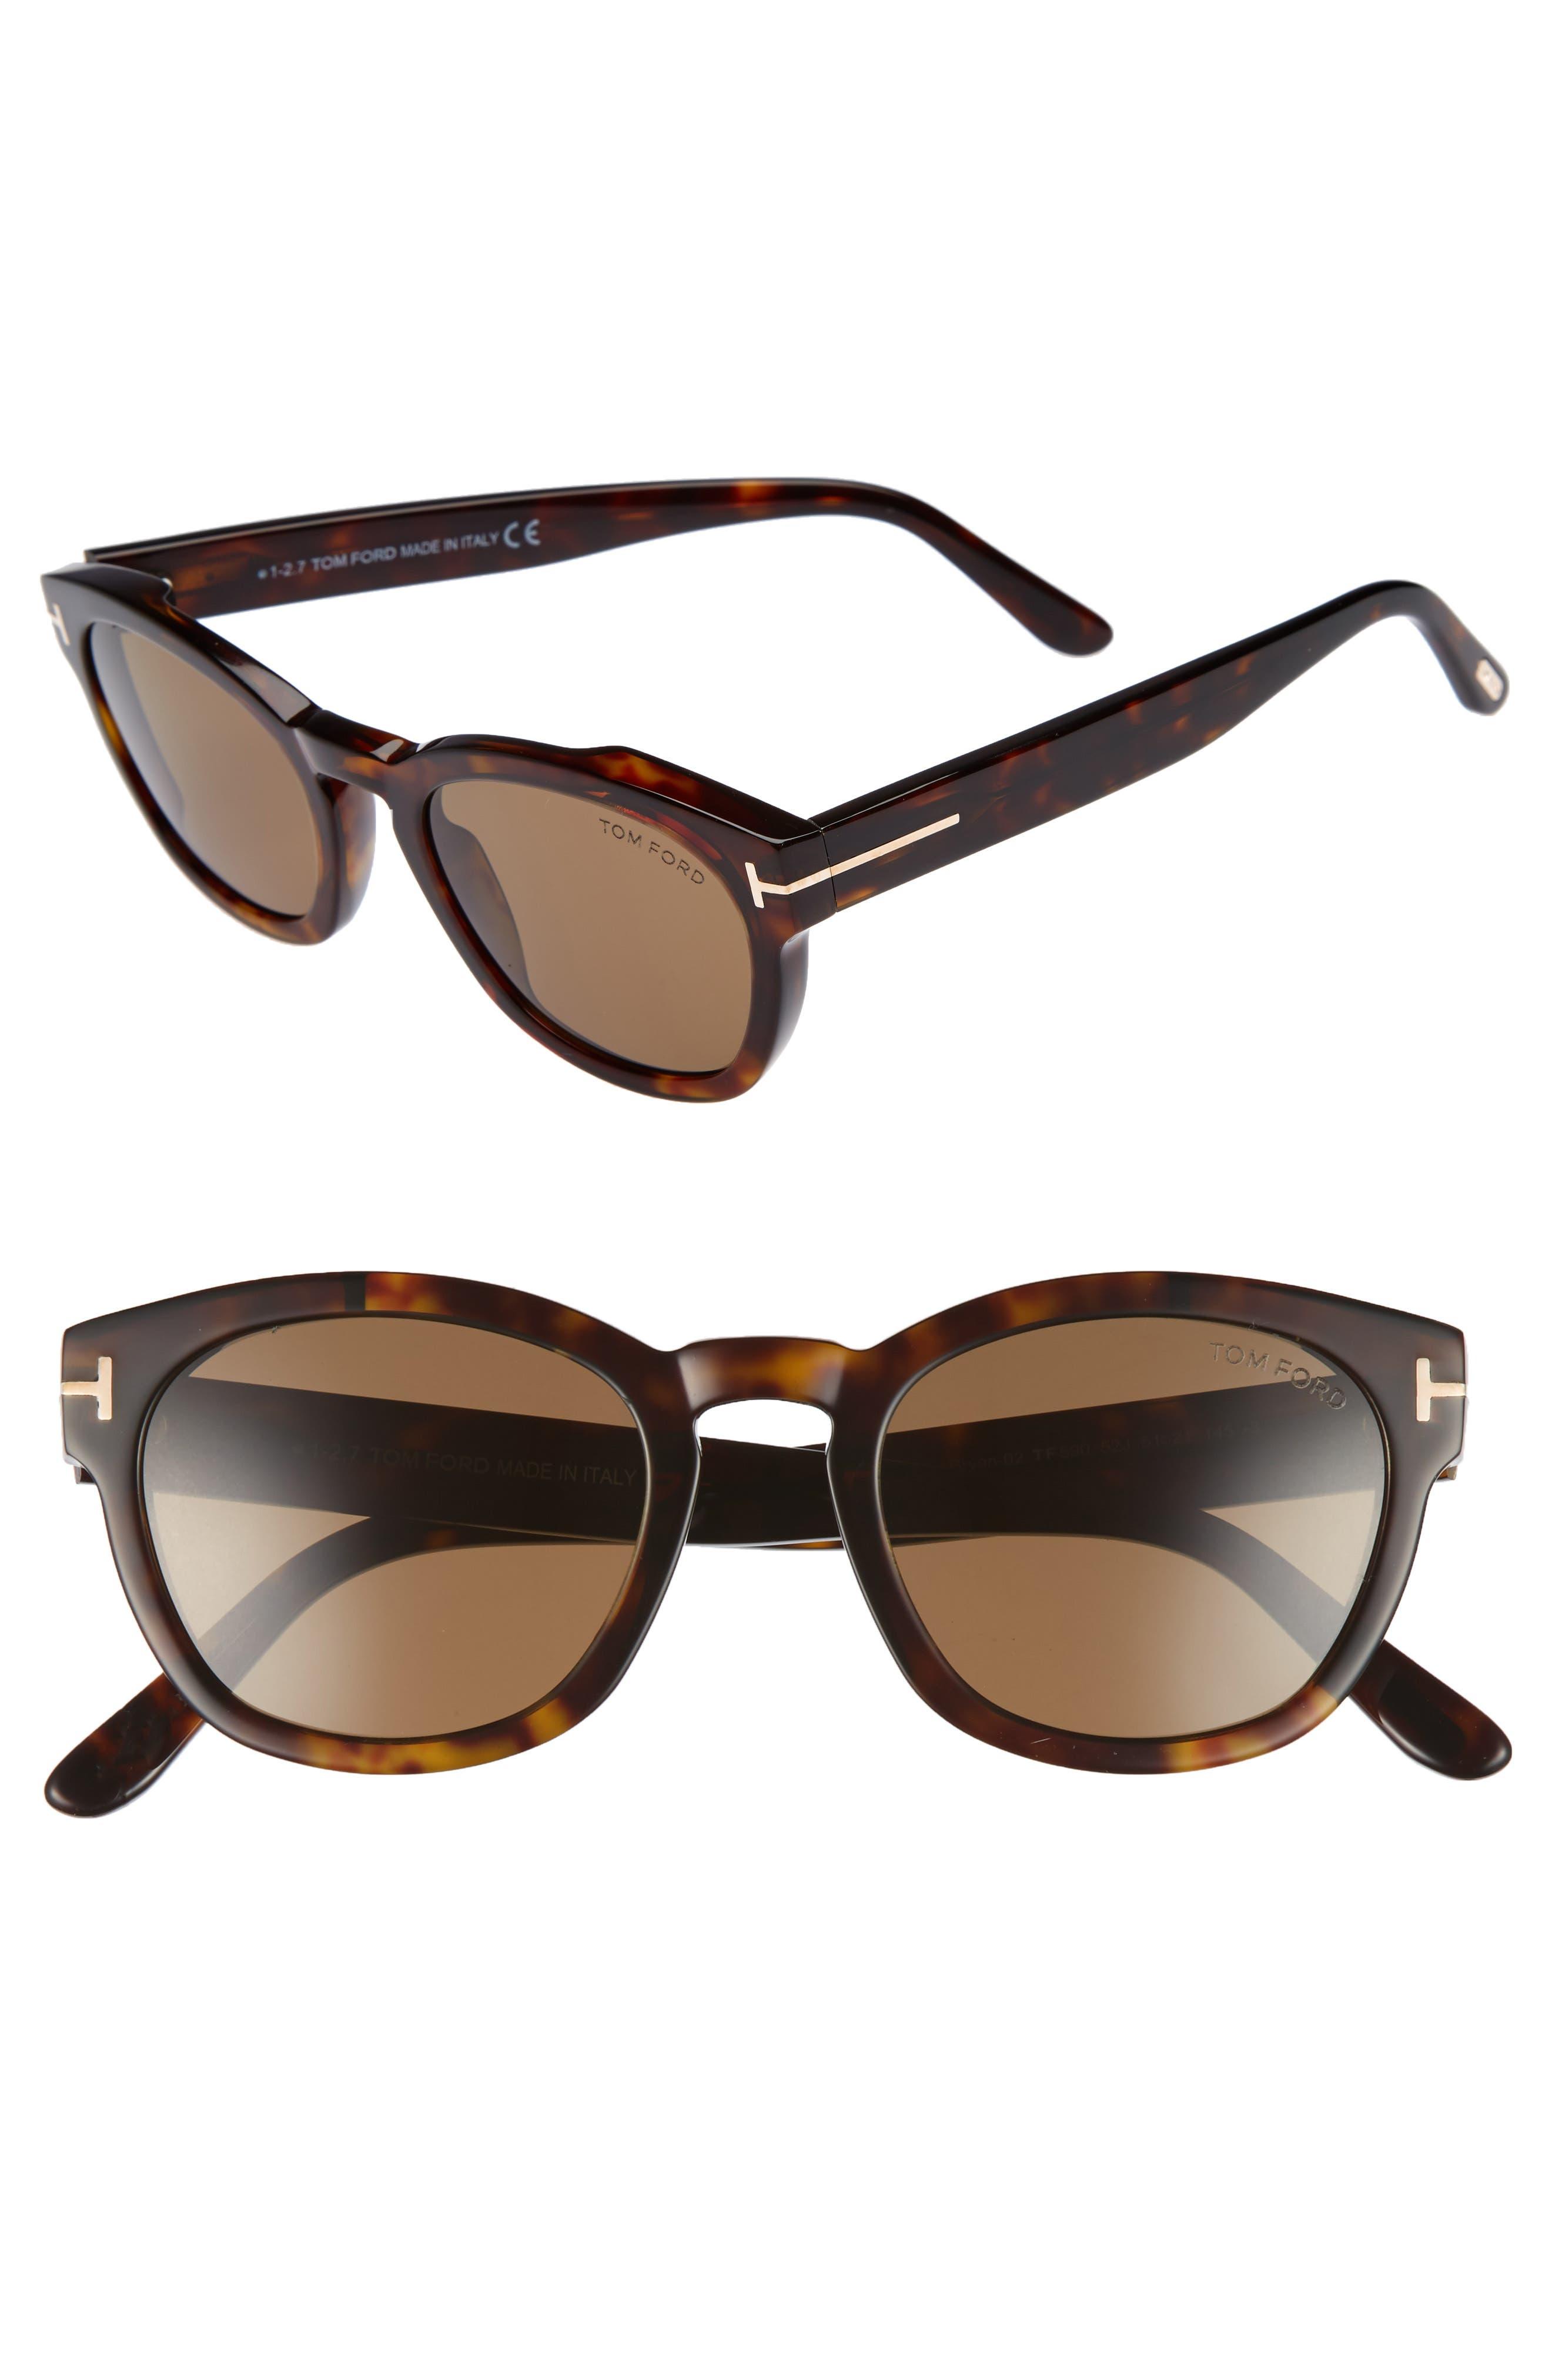 Bryan 51mm Sunglasses,                             Main thumbnail 1, color,                             DARK HAVANA/ ROVIEX